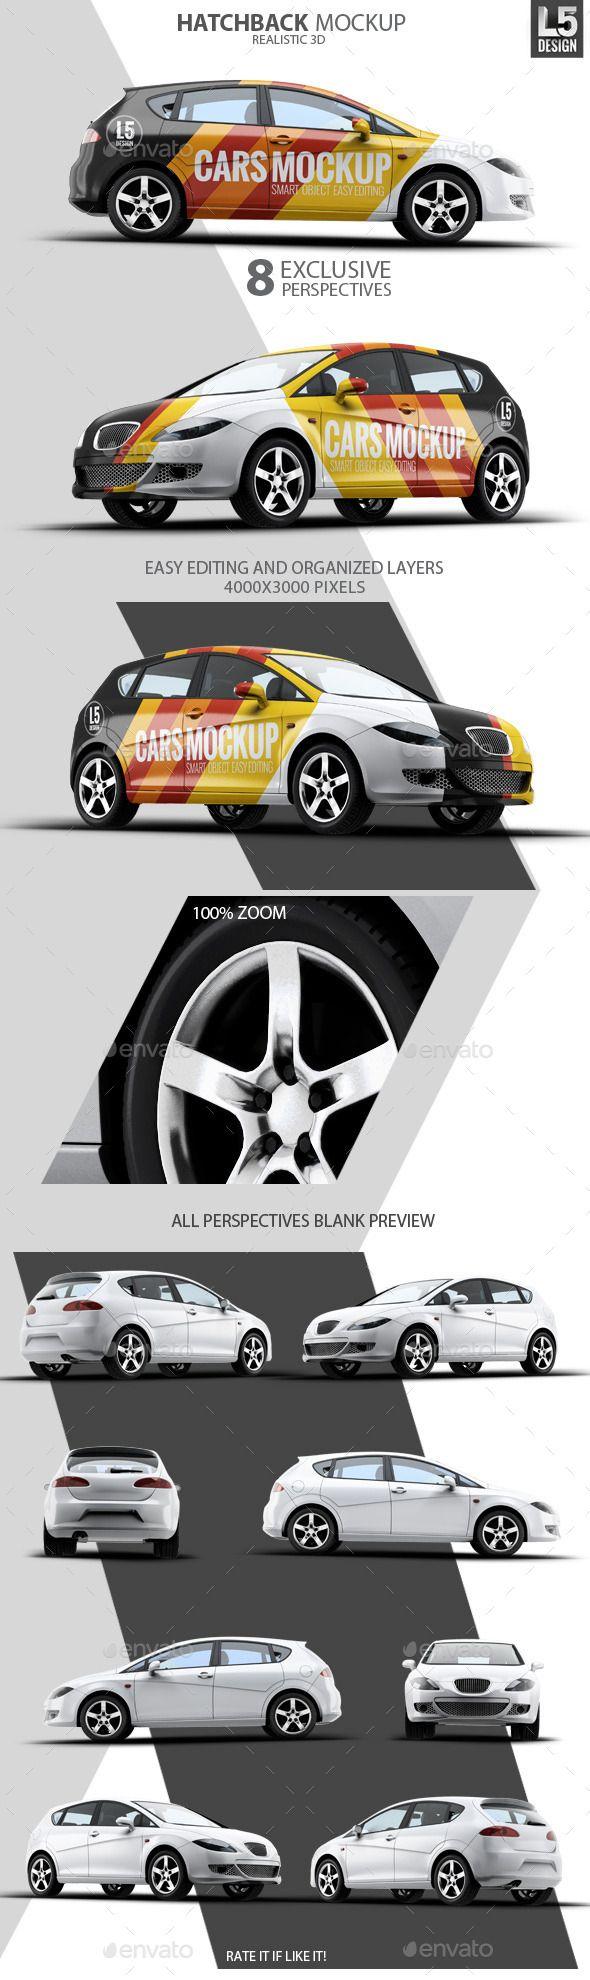 Car sticker design psd - Buy Hatchback Mock Up By On Graphicriver Hatchback Car Mock Up Set Includes 8 Psd Files 8 Realistic Perspectives Fully Layered Resolution